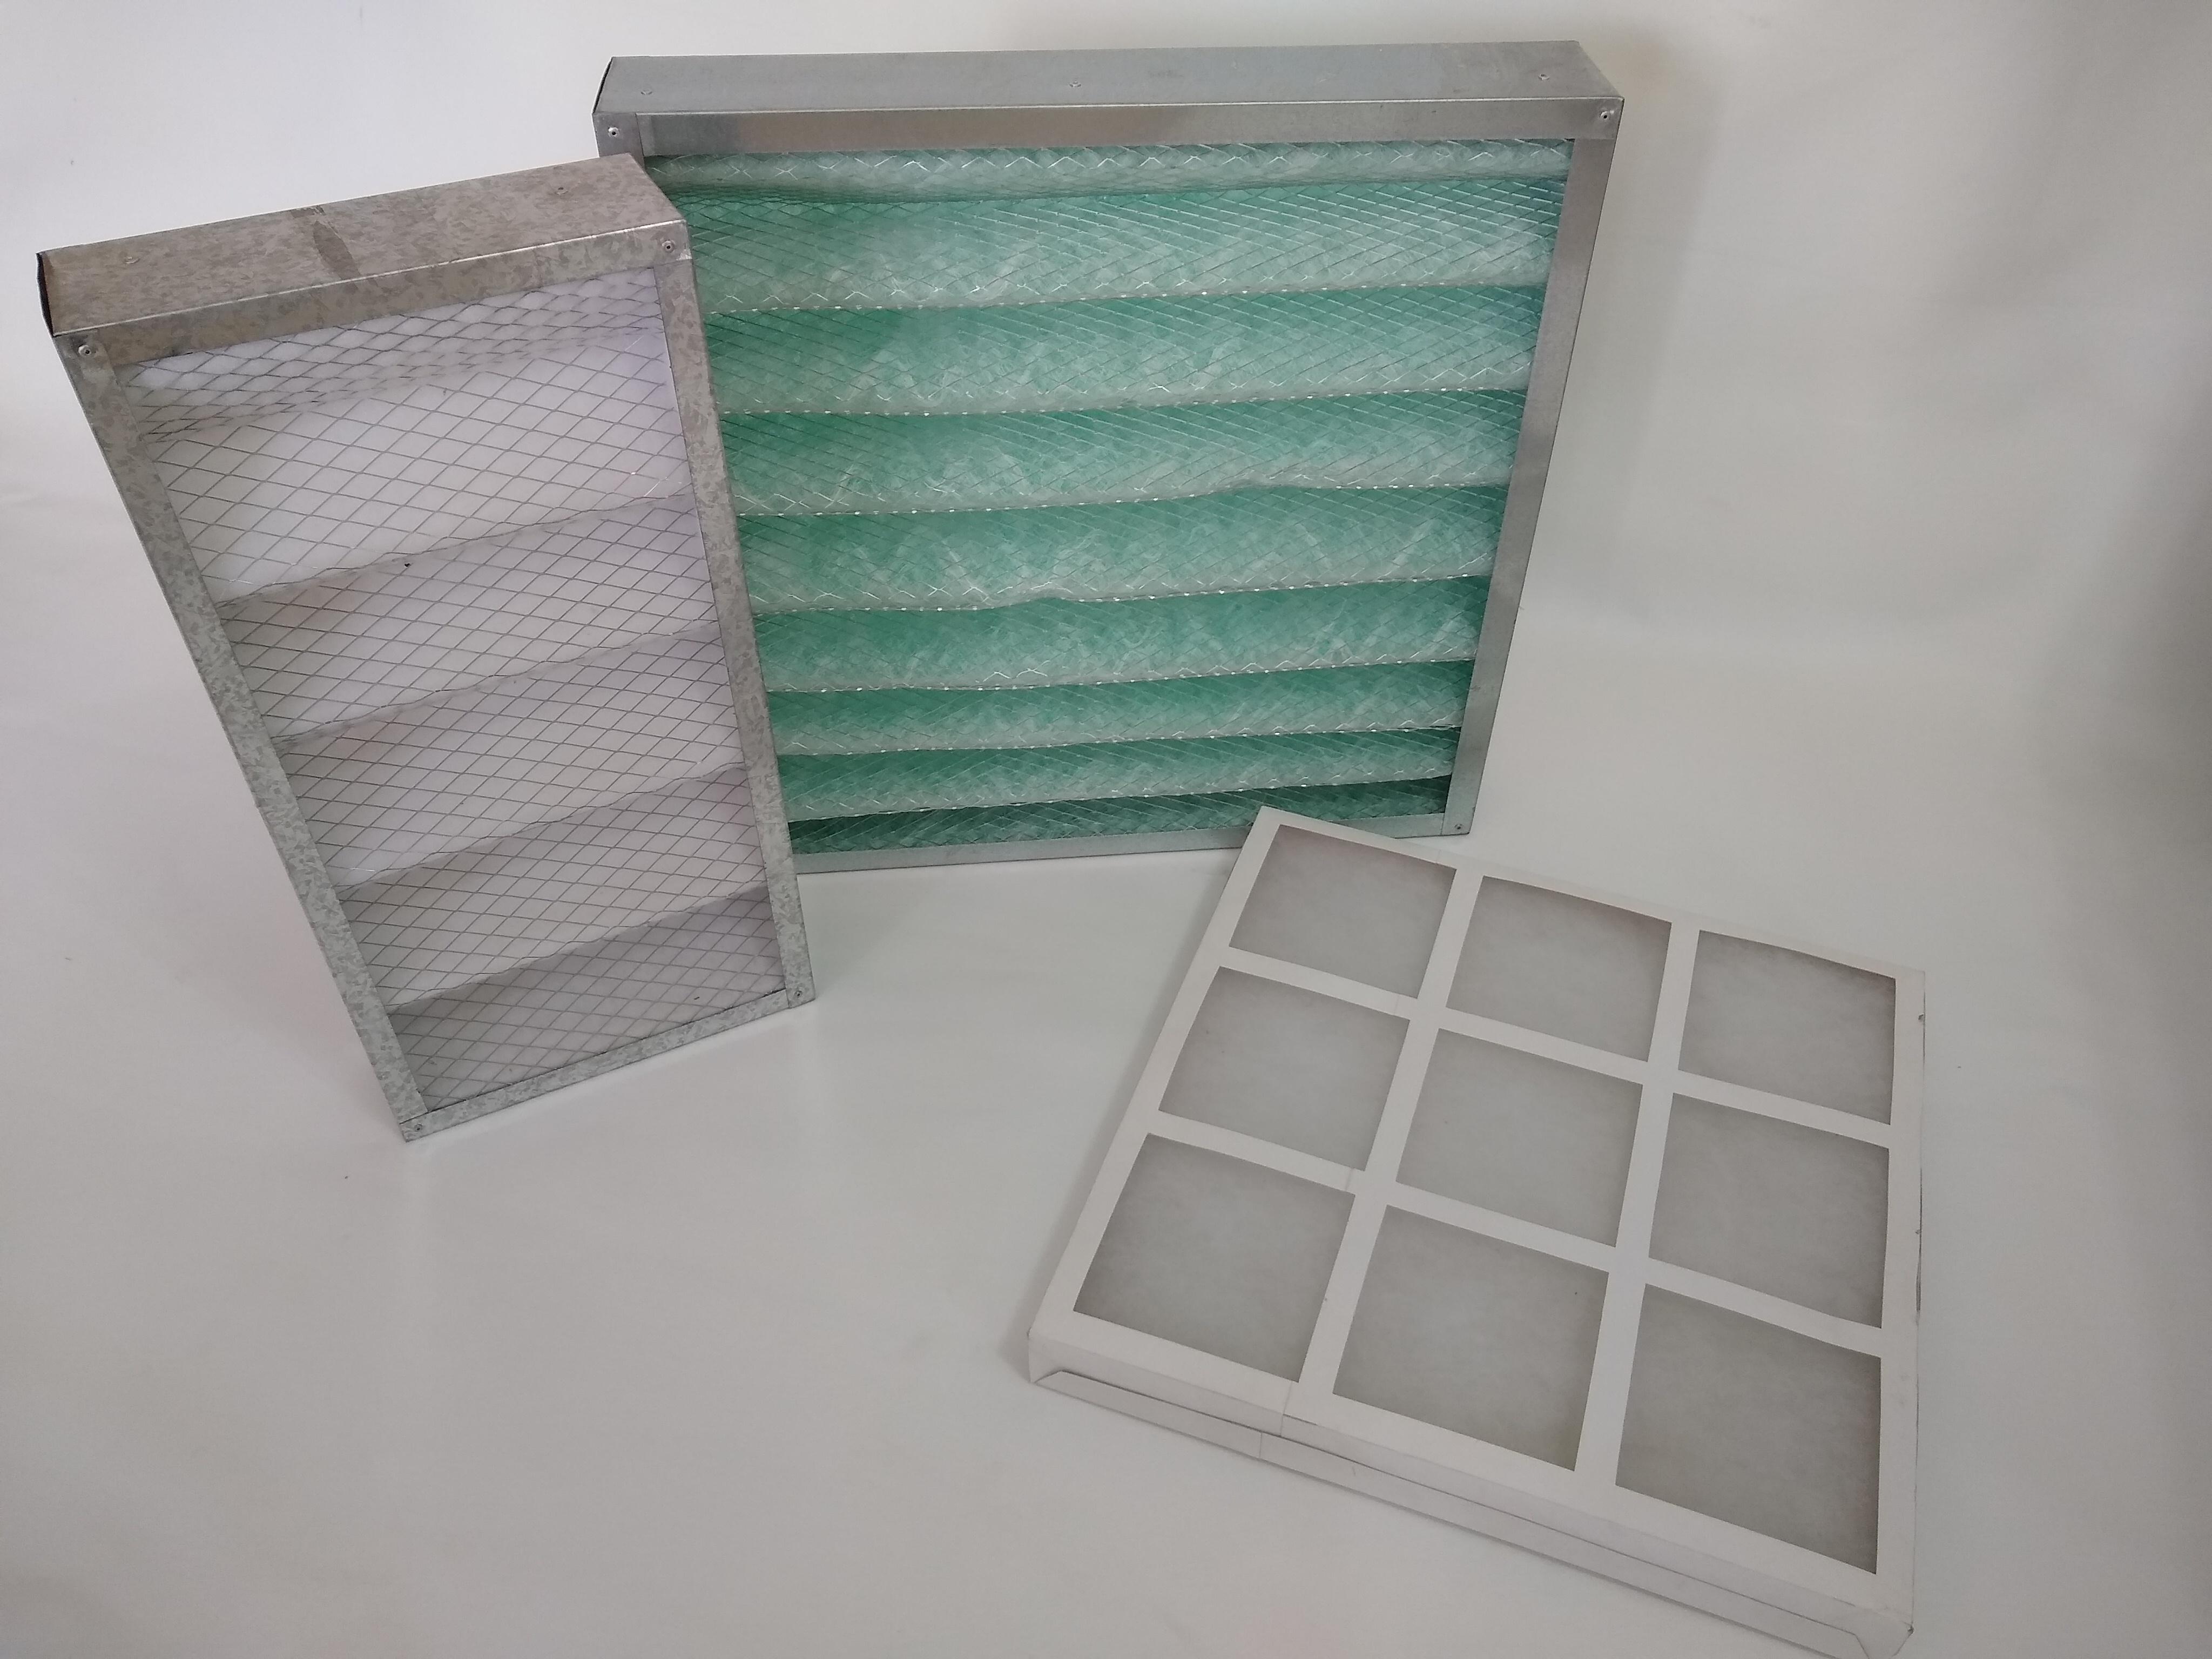 Filtro caixa